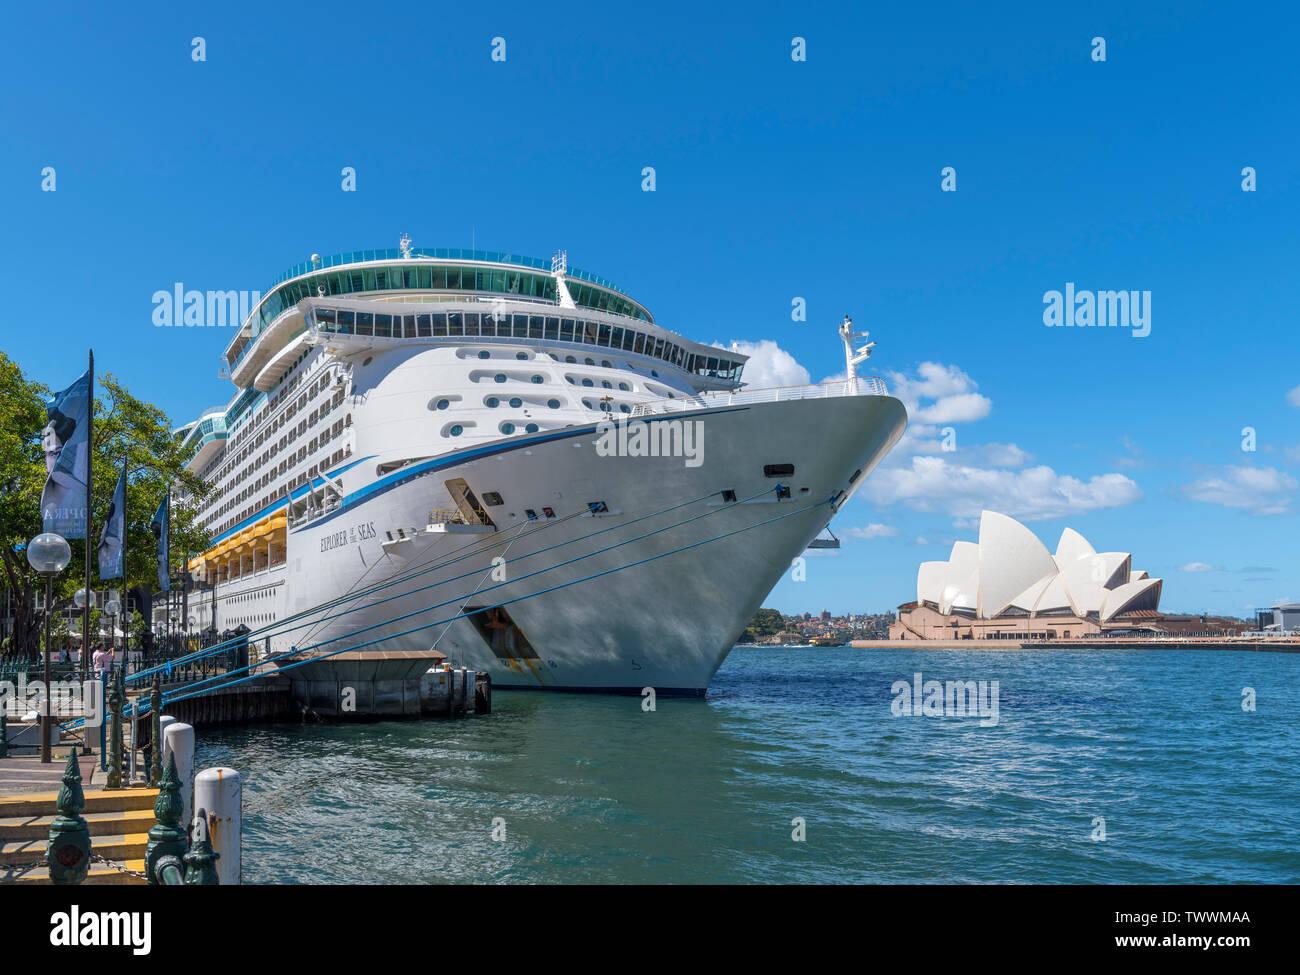 Explorer of the Seas cruise ship at Circular Quay with Sydney Opera House behind, Sydney, Australia - Stock Image